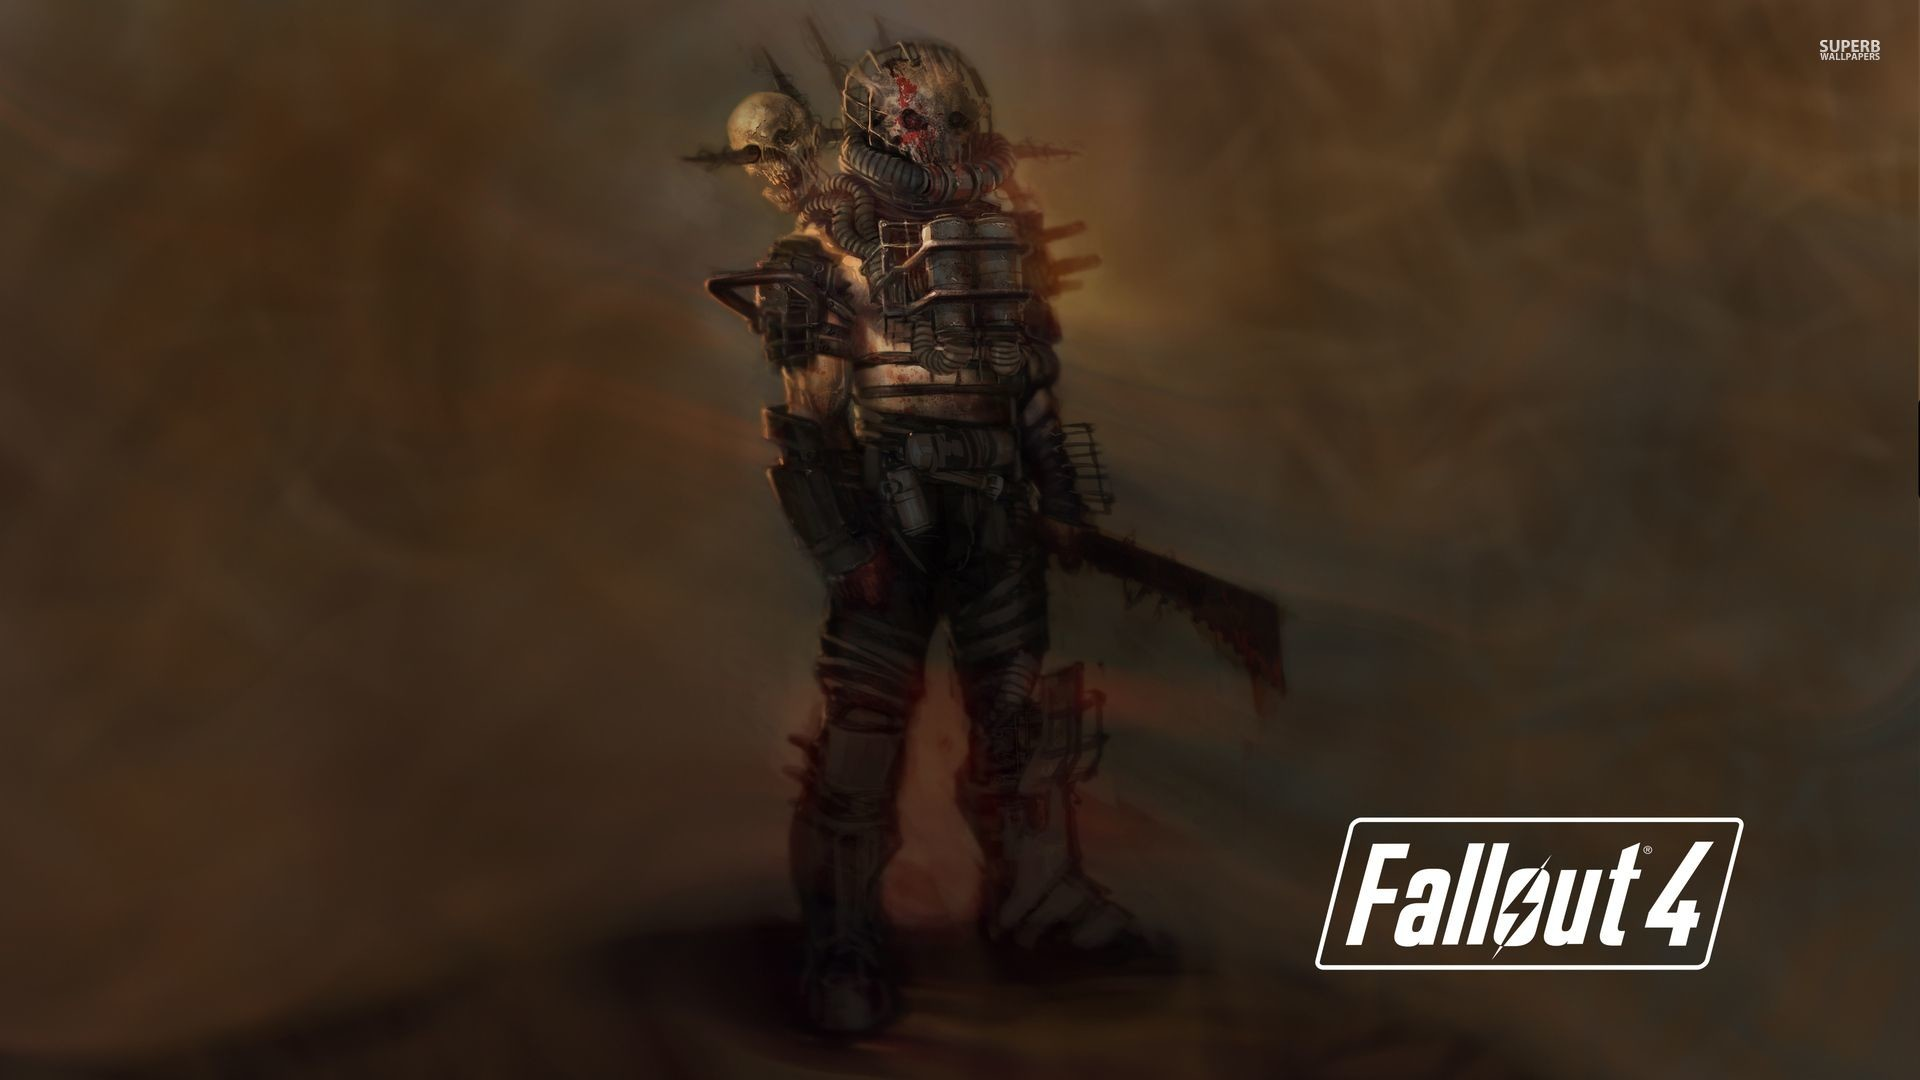 Fallout 4 raider holding a machete wallpaper – Game wallpapers .